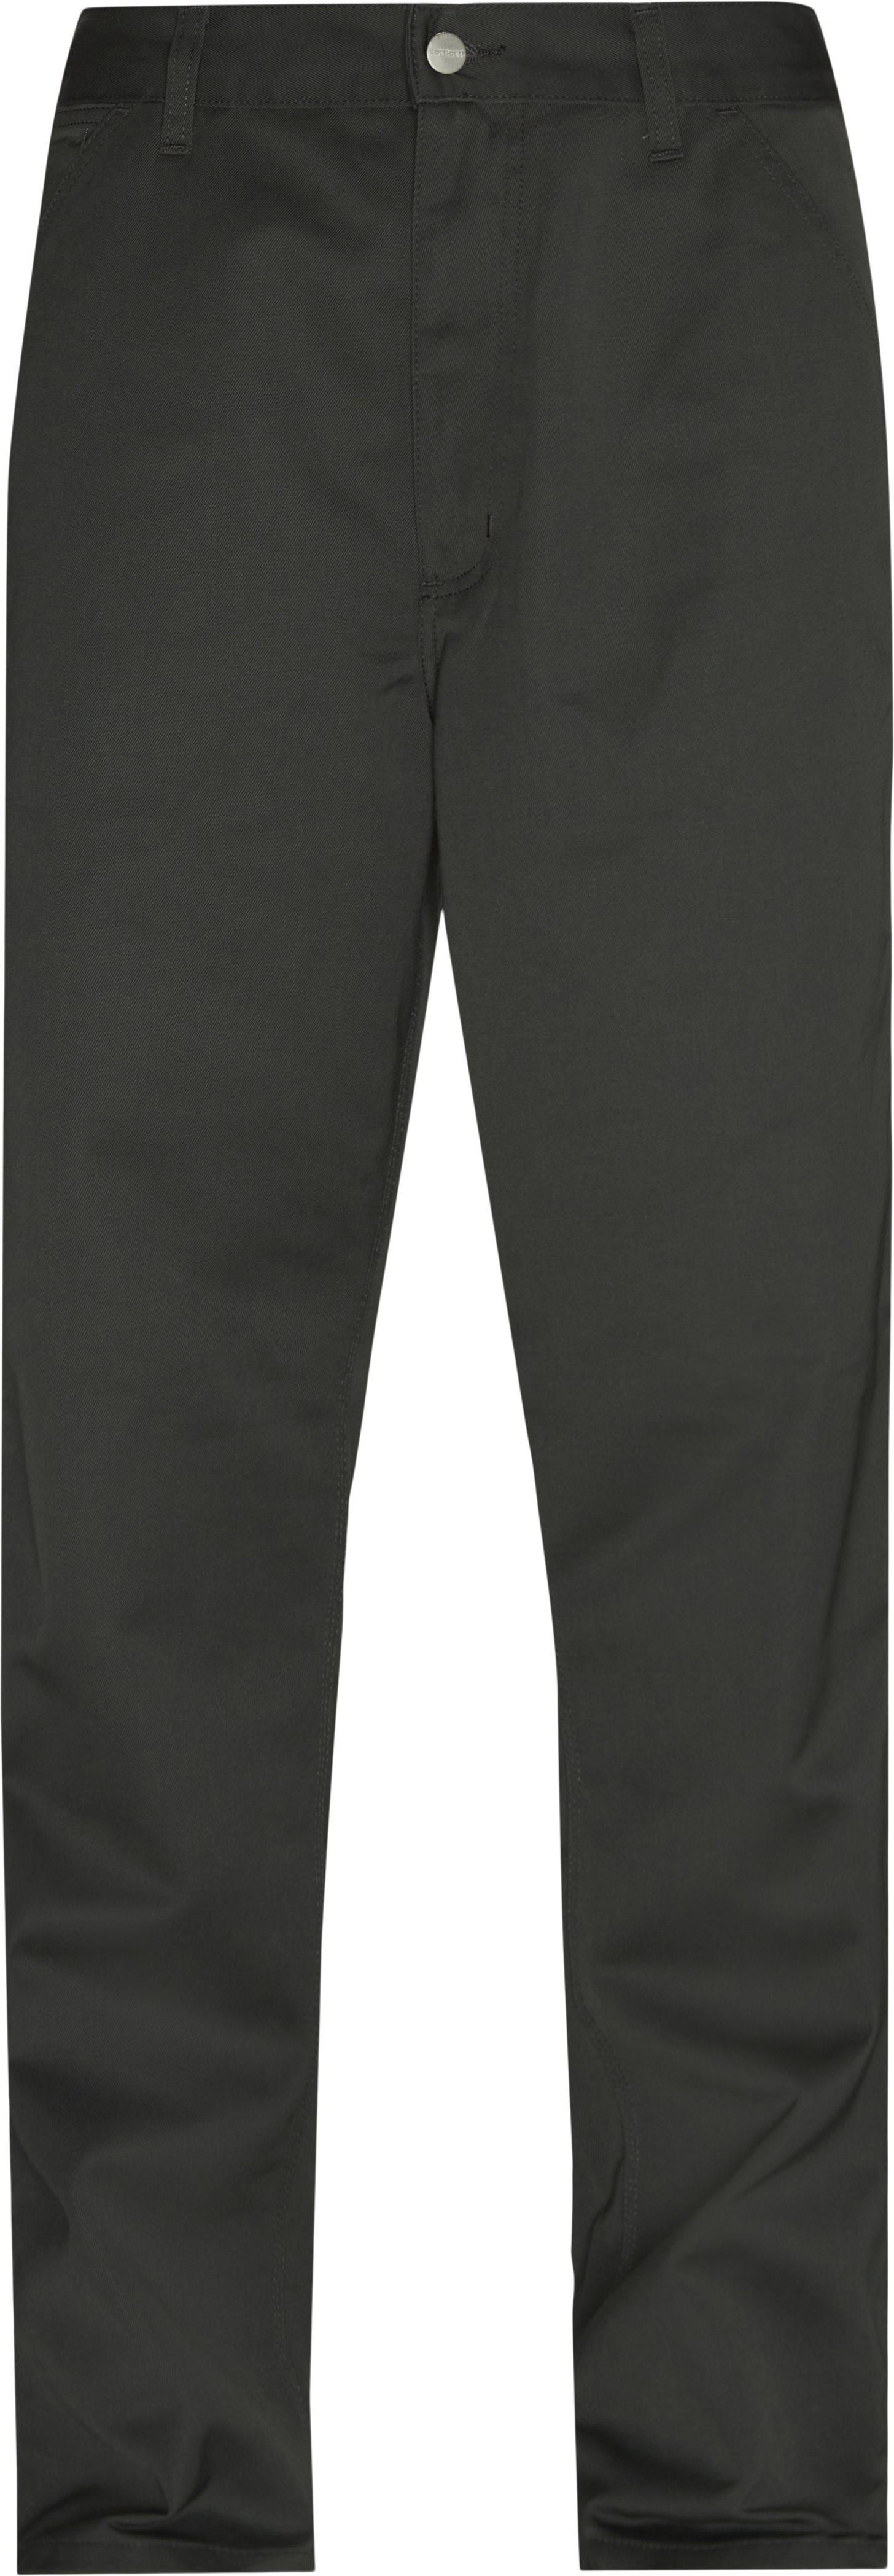 Simple Pant - Byxor - Straight fit - Svart